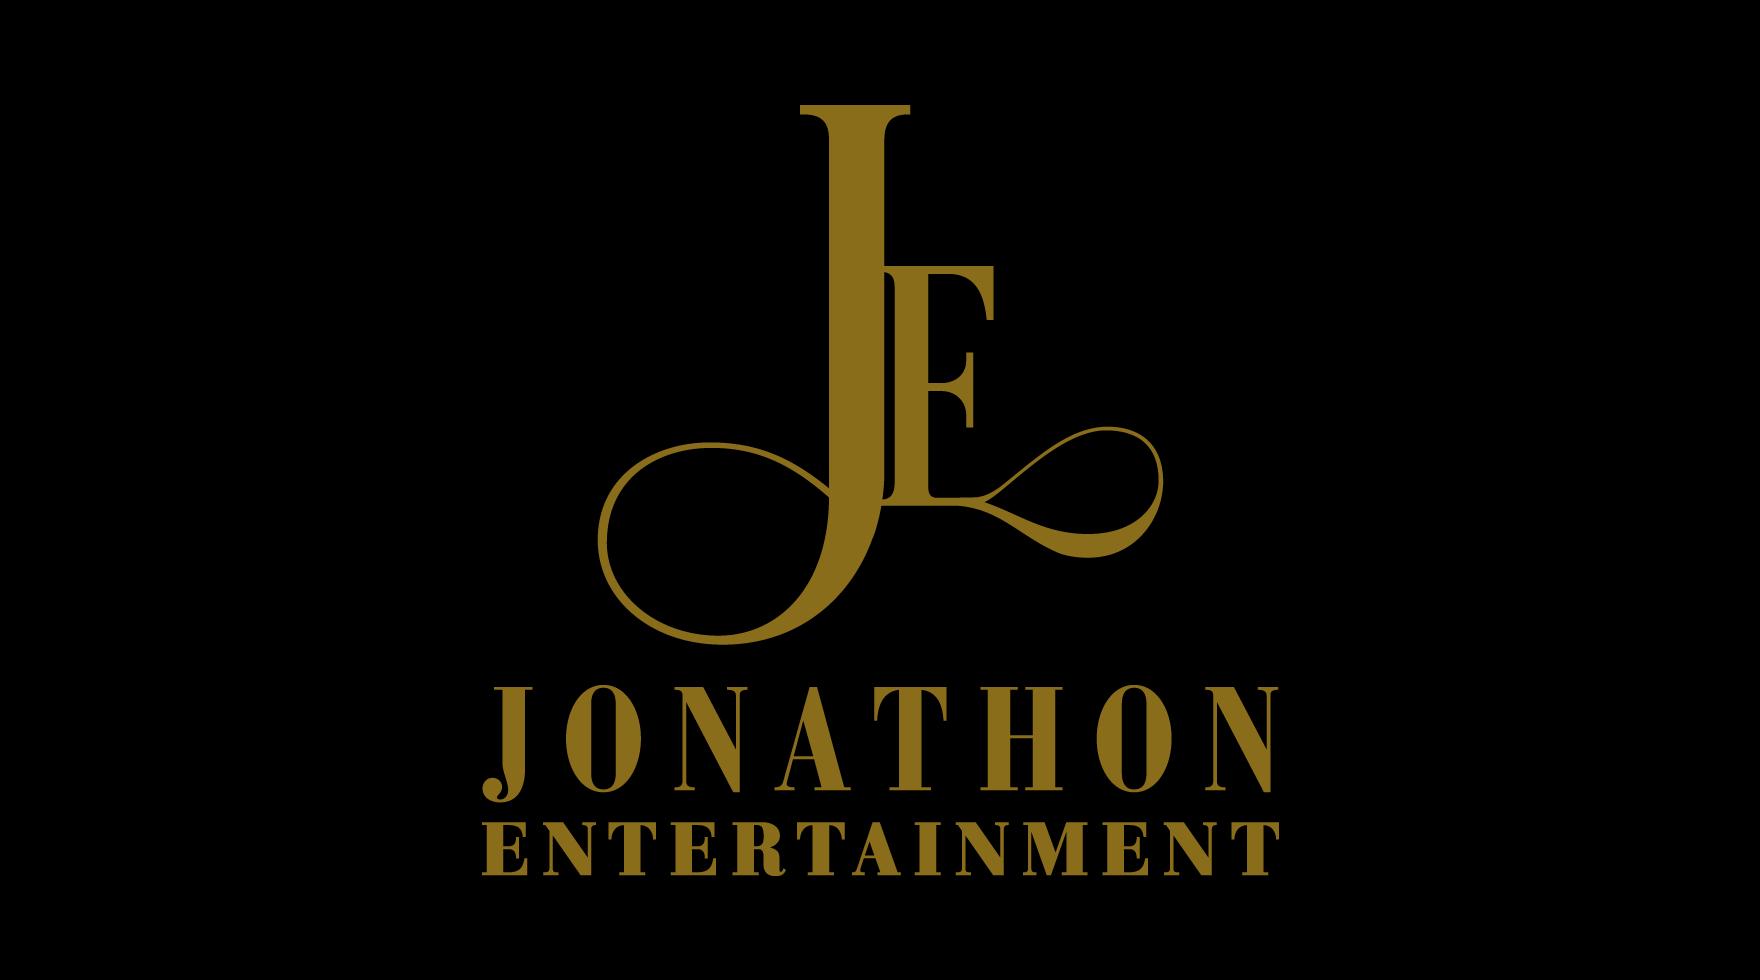 logodesign-jonathon-entertainment-by-webkreation